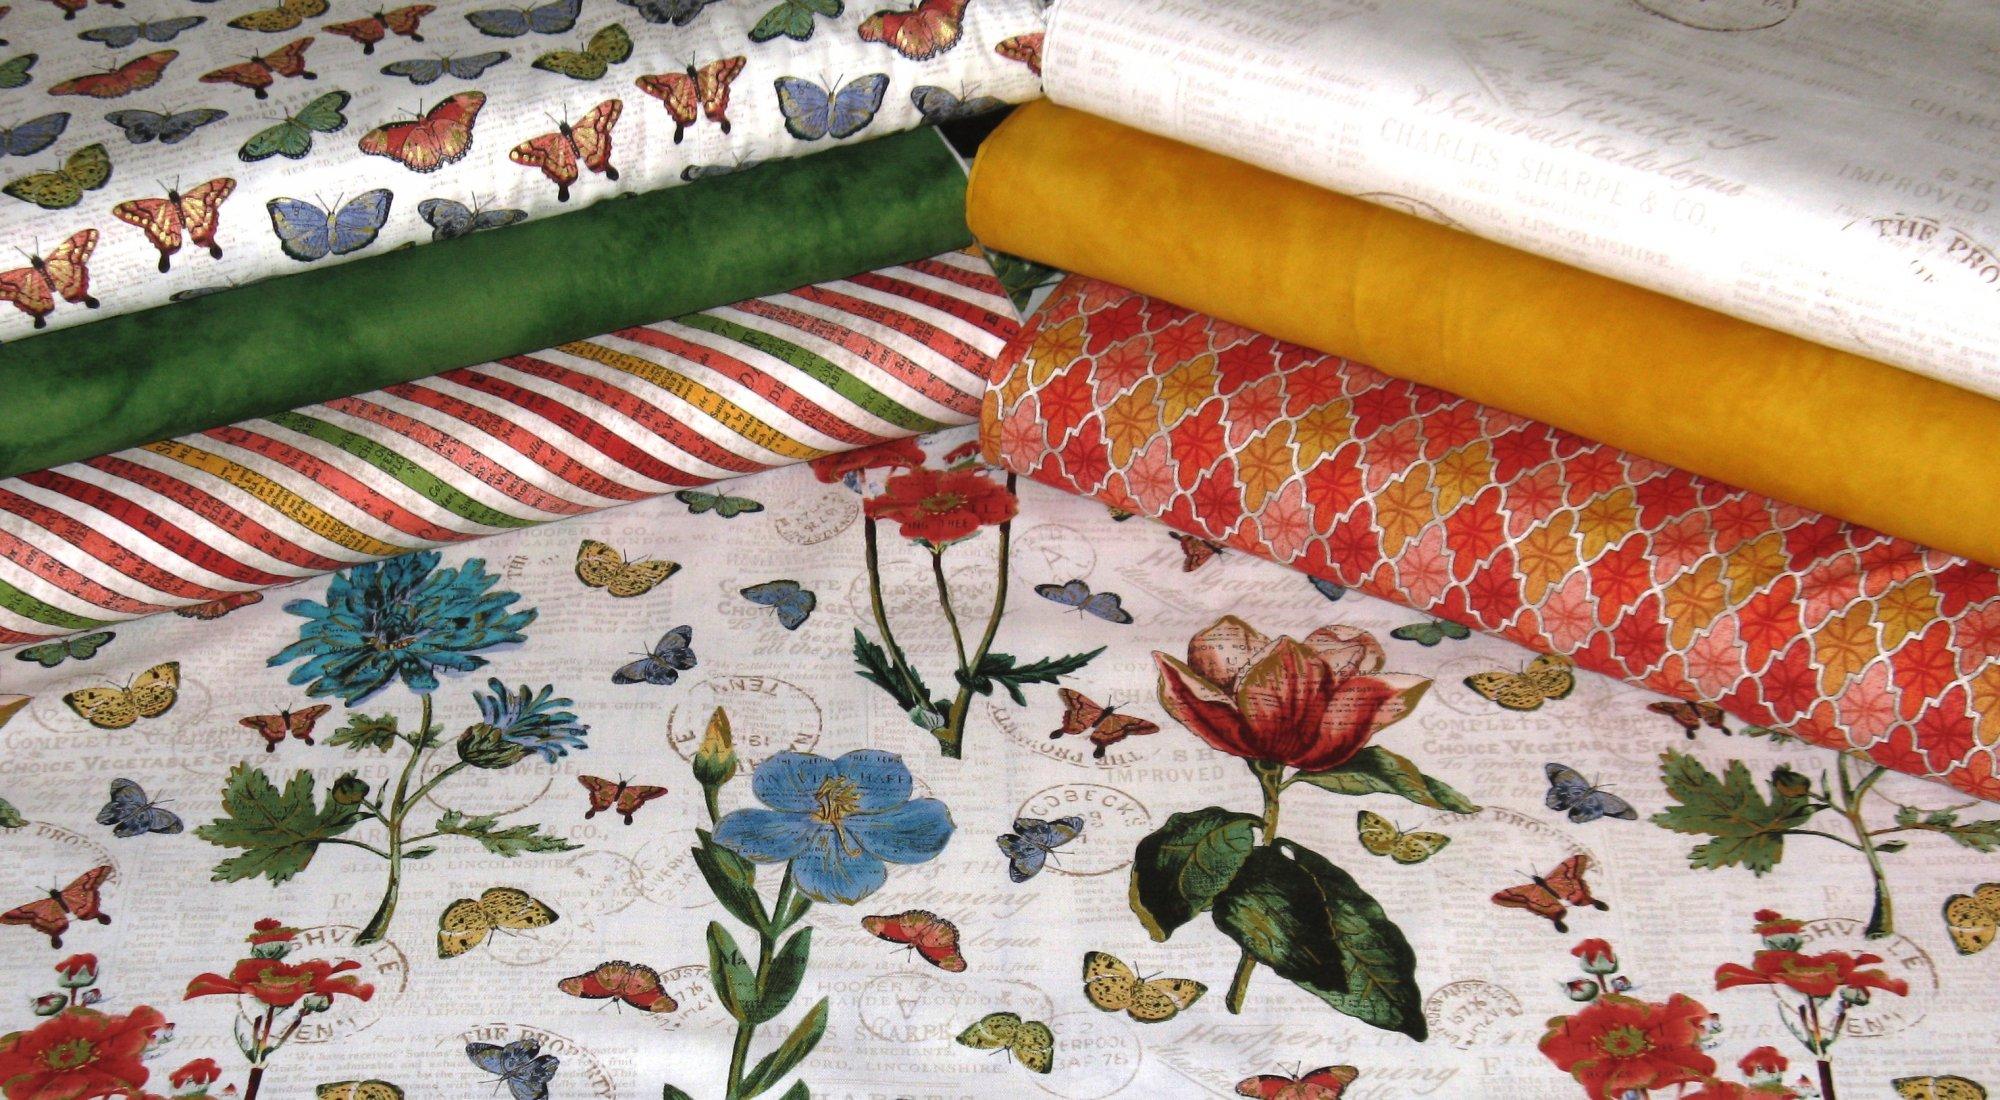 Anna s Sewing Center | Fairview Park, Ohio | Machine Dealer and ... : quilt shops ohio - Adamdwight.com